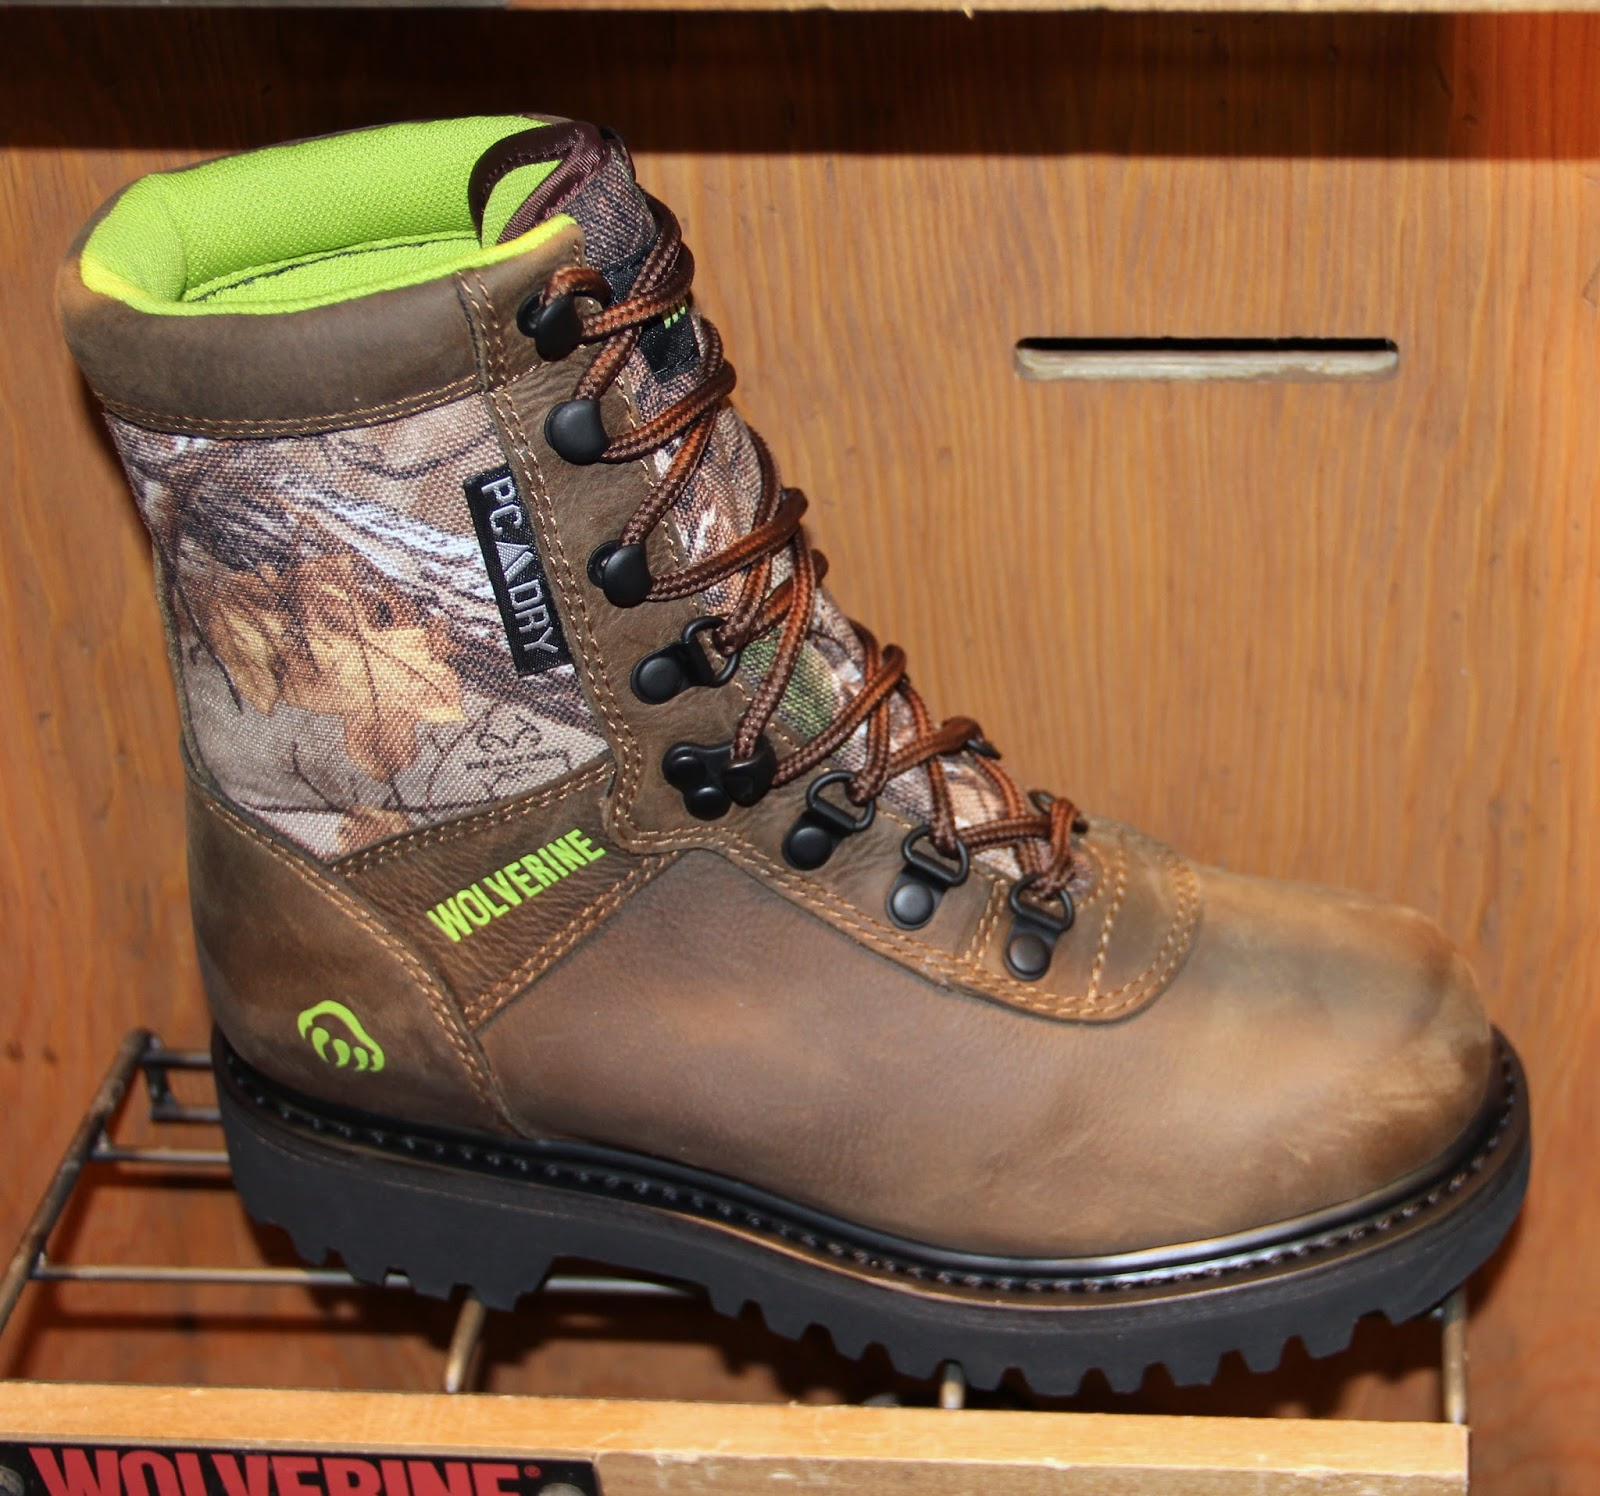 Full grain leather-900 Denier poly upper…Ridge Hunting-w/ dial comfort ICS+  disc in heel